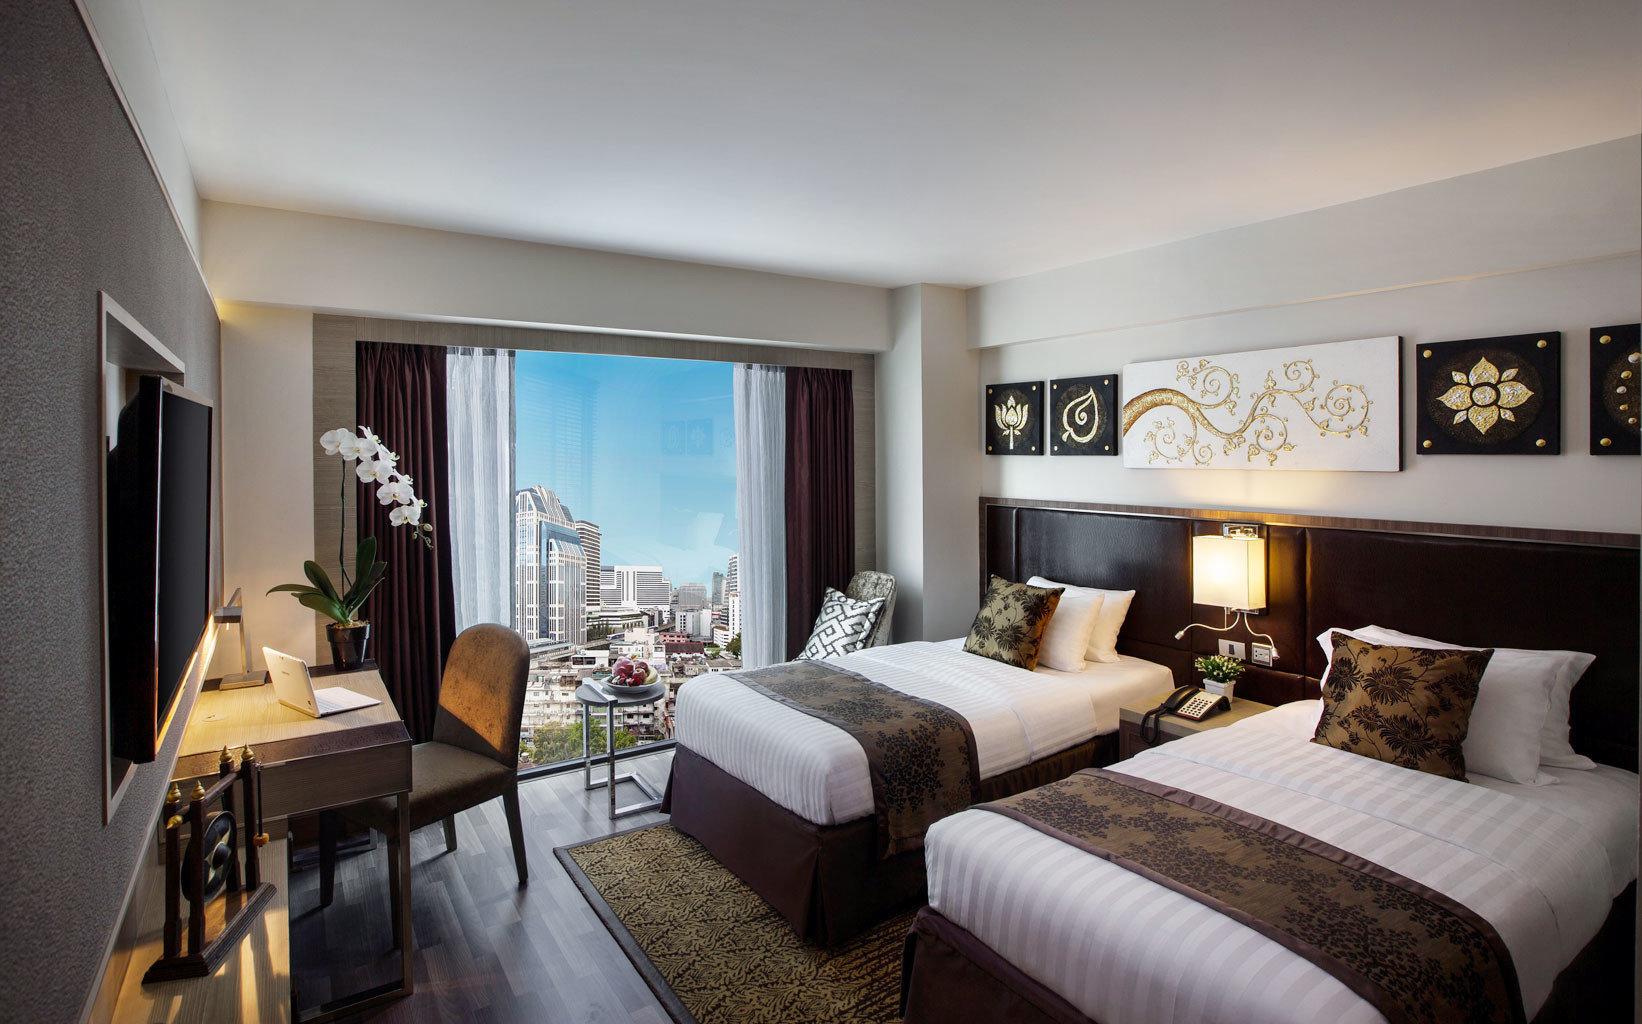 Bedroom Hip Luxury Modern Scenic views Suite sofa property home living room condominium Villa Resort flat